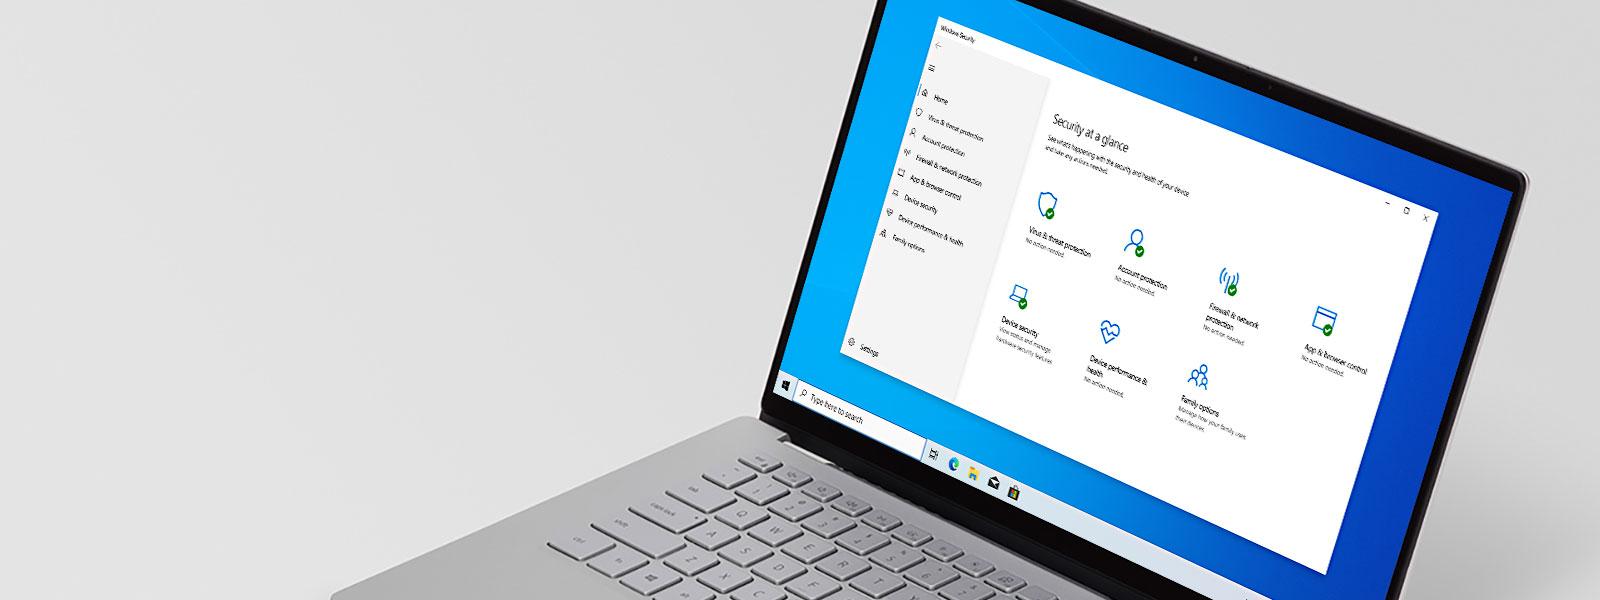 Microsoft Defender ウイルス対策ウィンドウを表示する Windows 10 ラップトップ